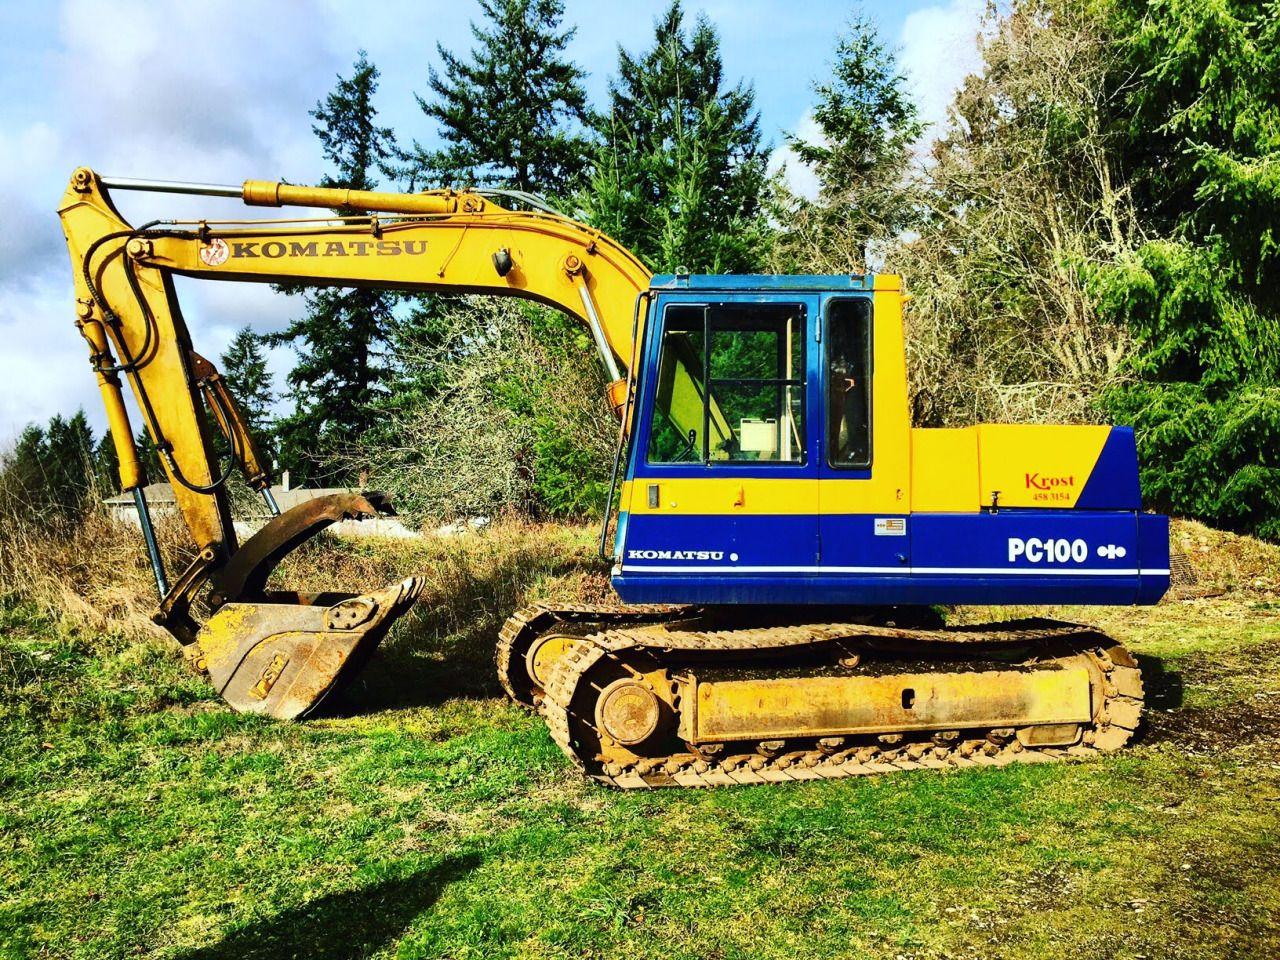 Hydraulic Excavator · Repair Manuals · BEST KOMATSU PC100-6, PC120-6,  PC120LC-6, PC130-